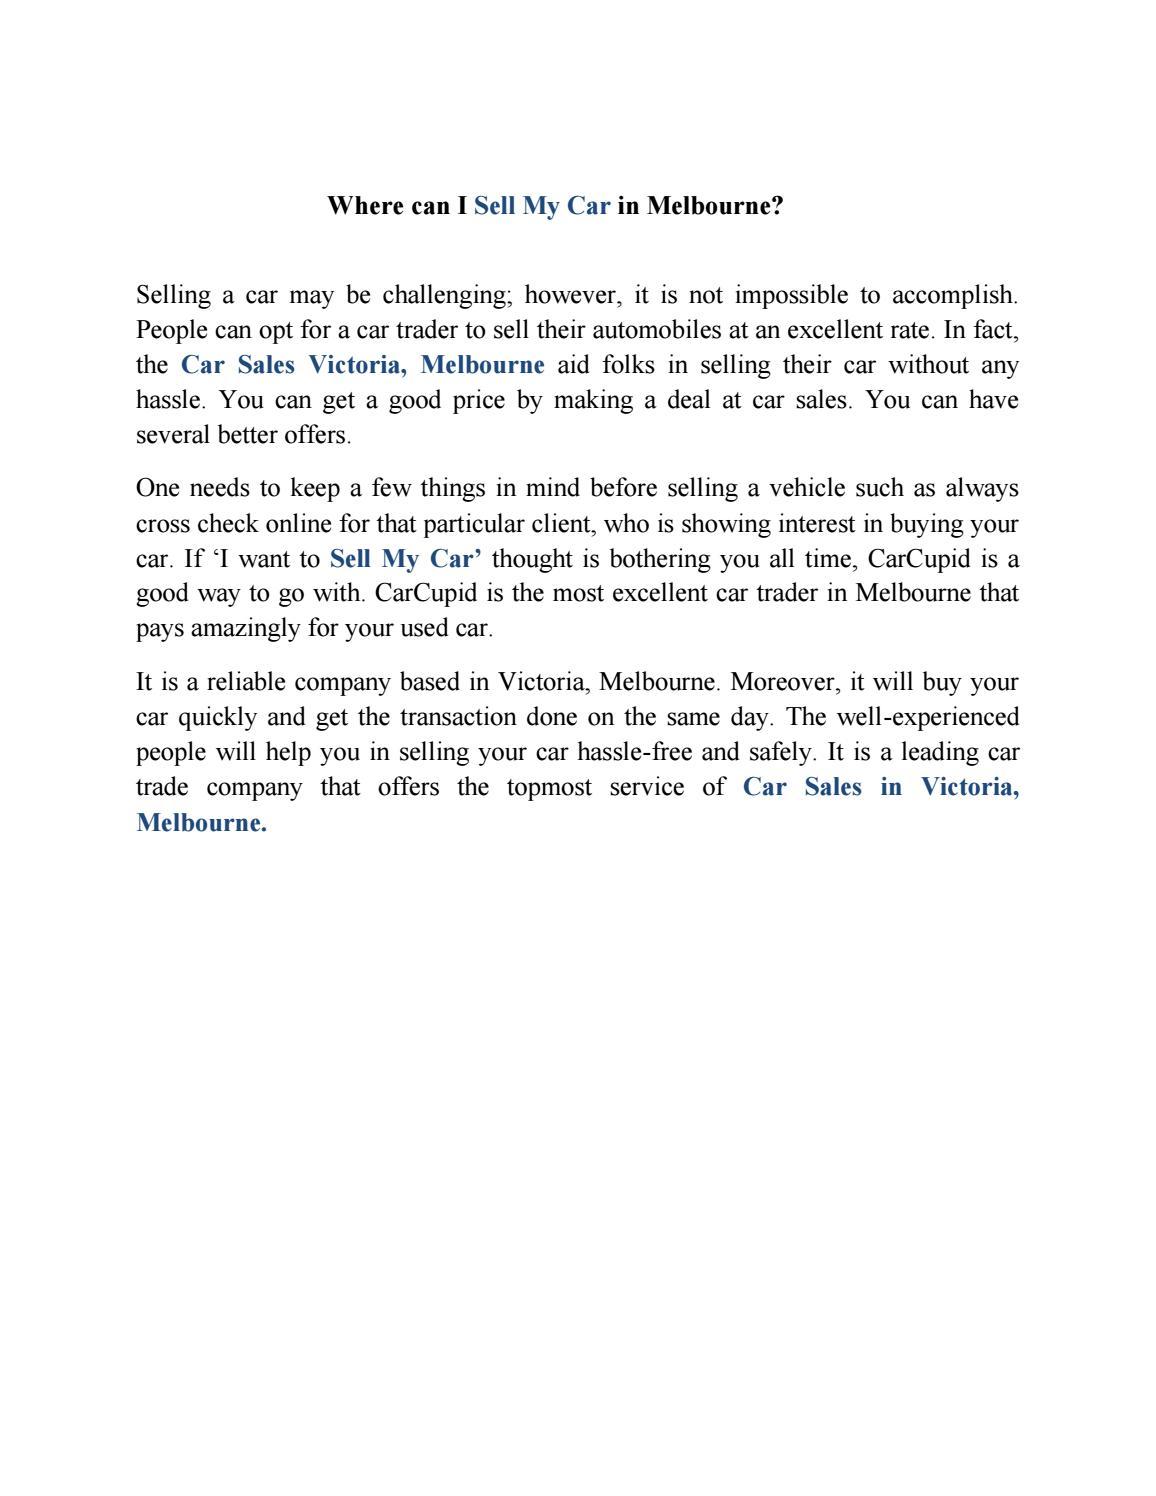 Carcupid document sharing car sales victoria by carcupid - issuu